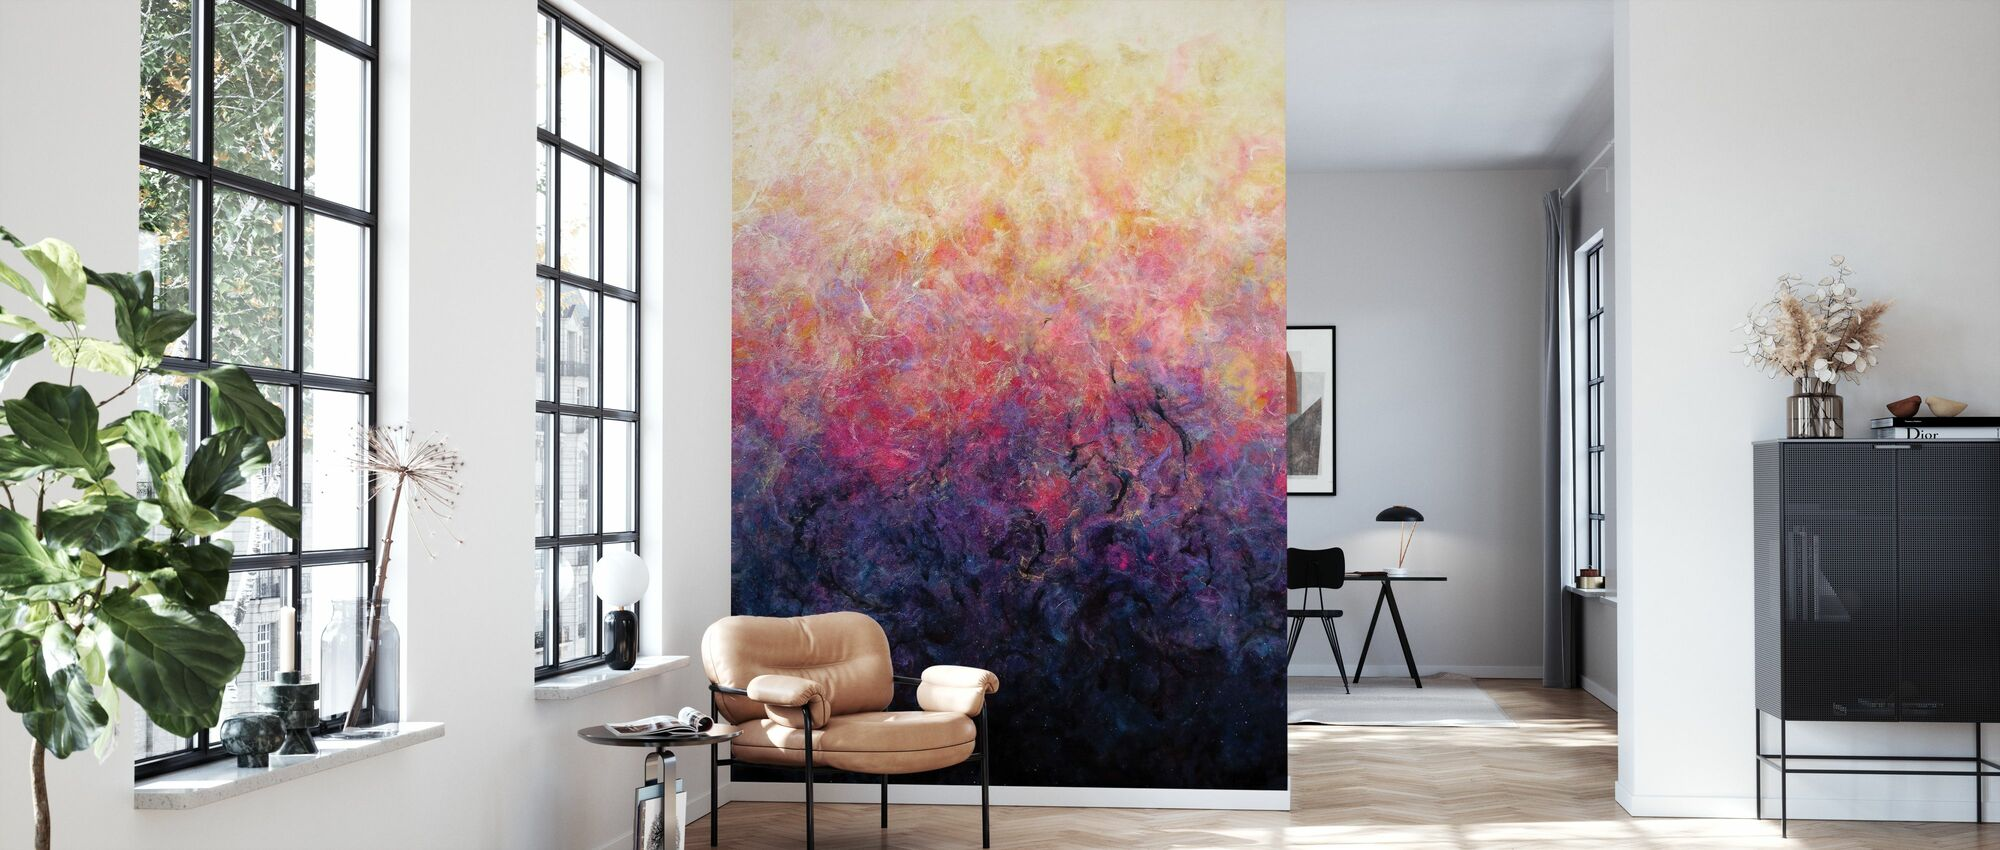 Requiem - Wallpaper - Living Room